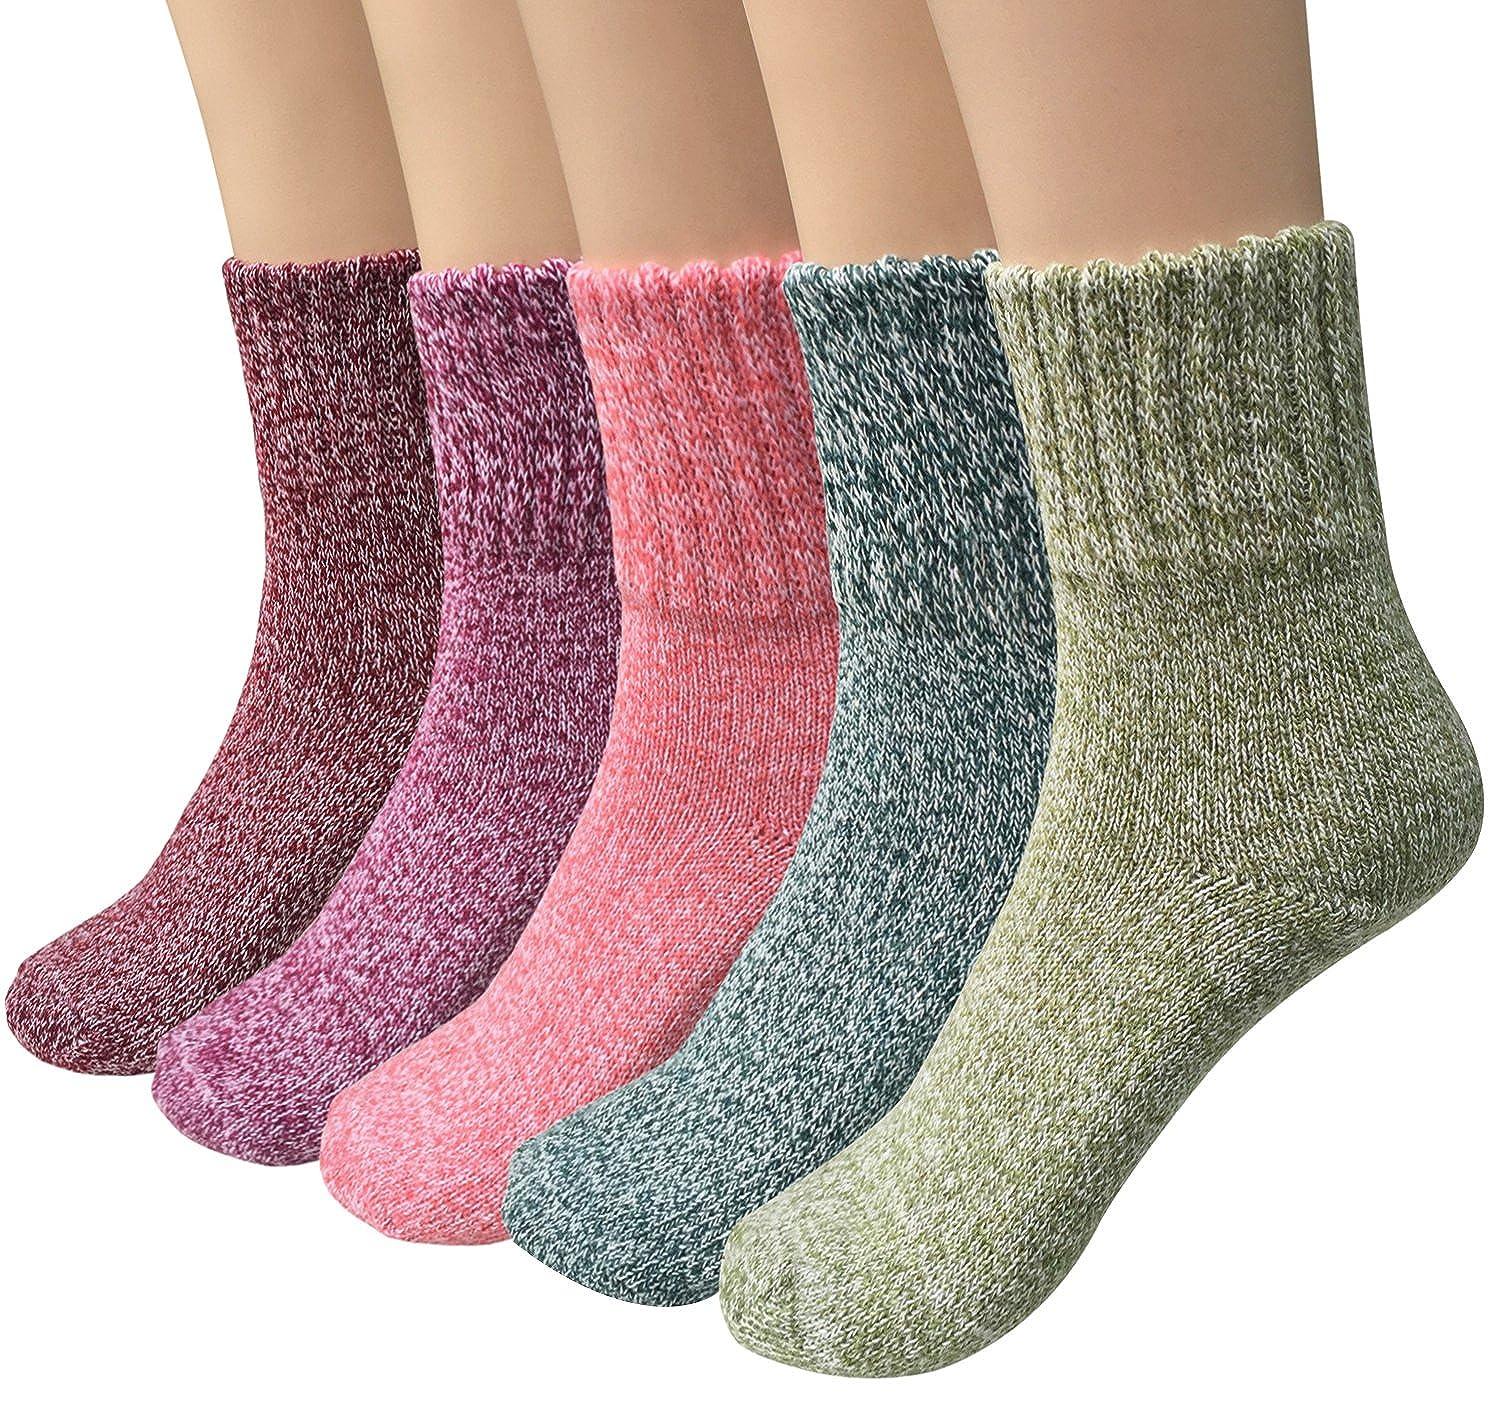 Loritta 5 Pairs Womens Vintage Style Winter Warm Thick Knit Wool Cozy Crew  Socks 03b3807066